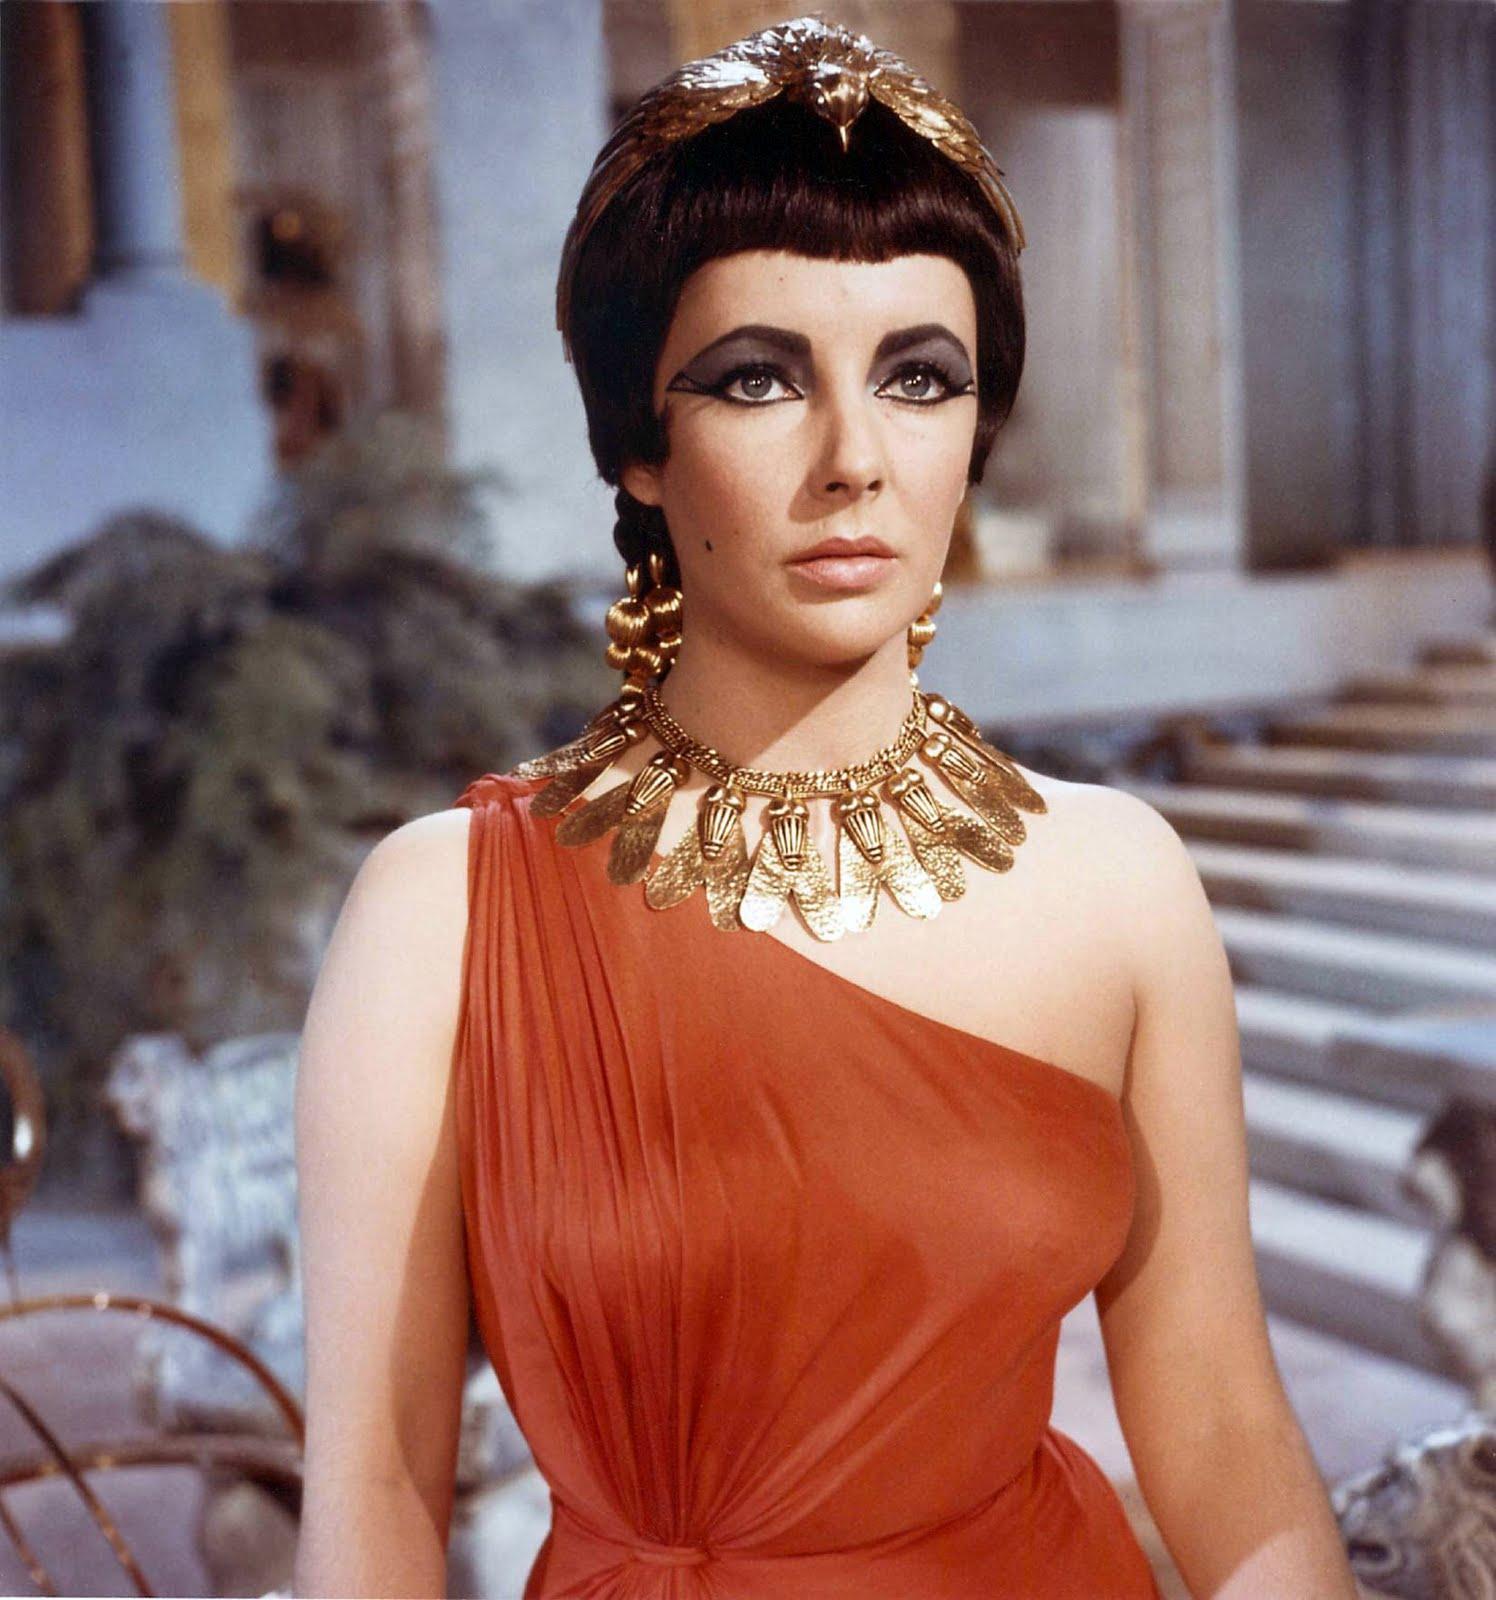 http://3.bp.blogspot.com/_8AGvLPIlhC4/S_uQuZkYrAI/AAAAAAAAAQg/Ij19CU3pyBQ/s1600/elizabeth-taylor-as-cleopatra.jpg